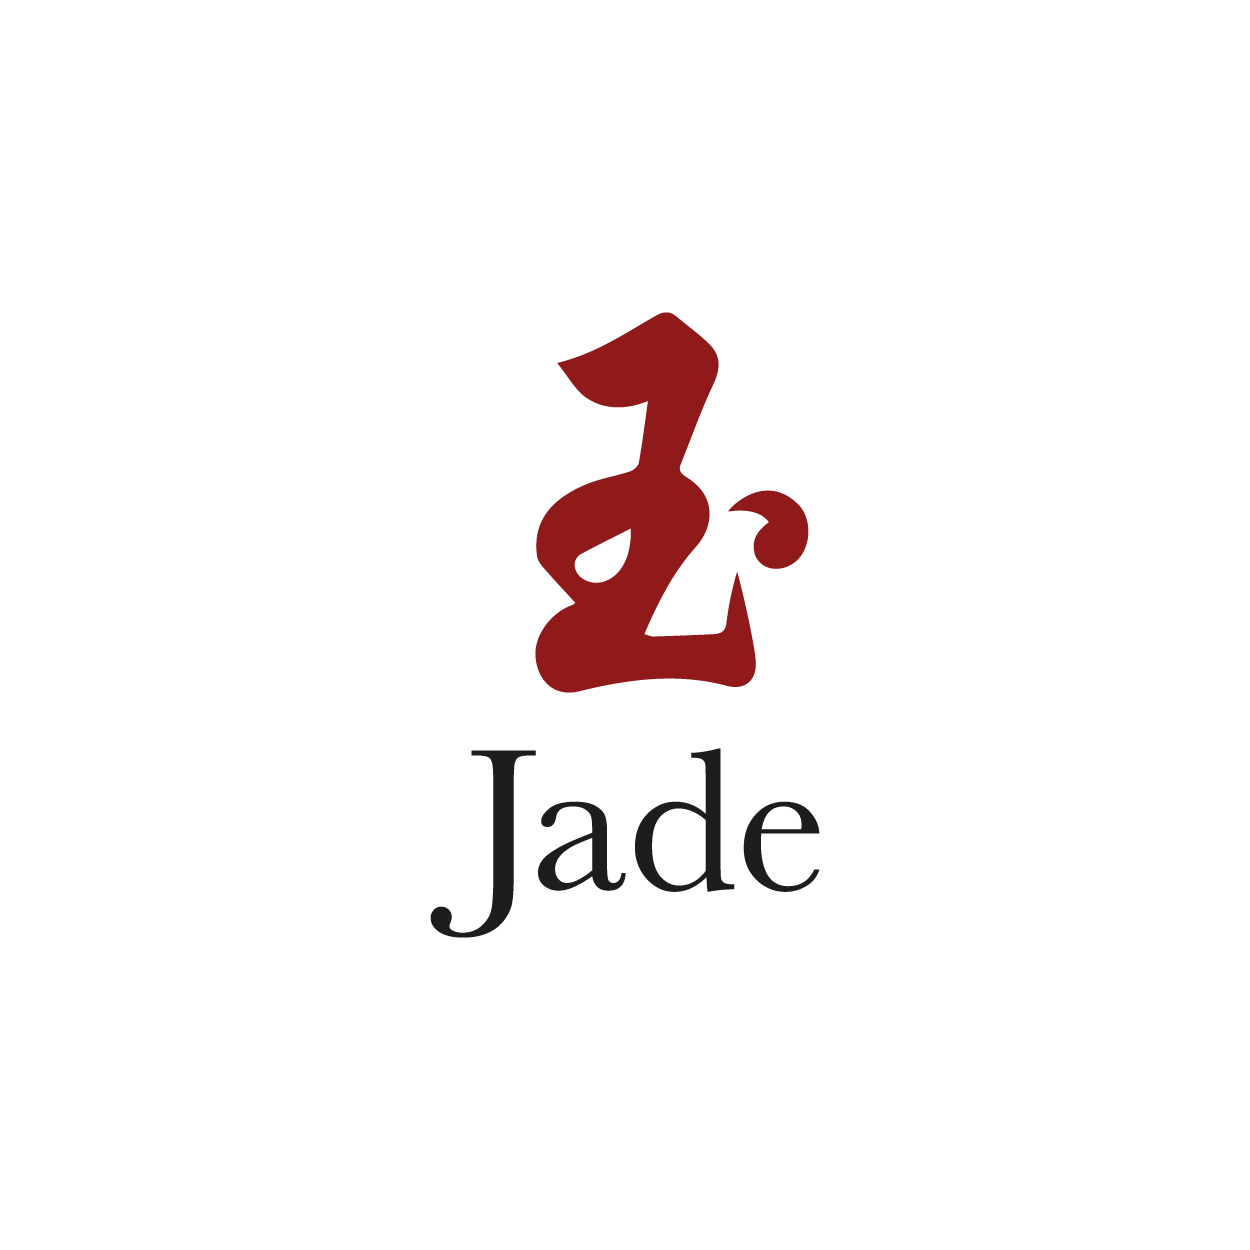 JADE_Plan de travail 1_Plan de travail 1.png